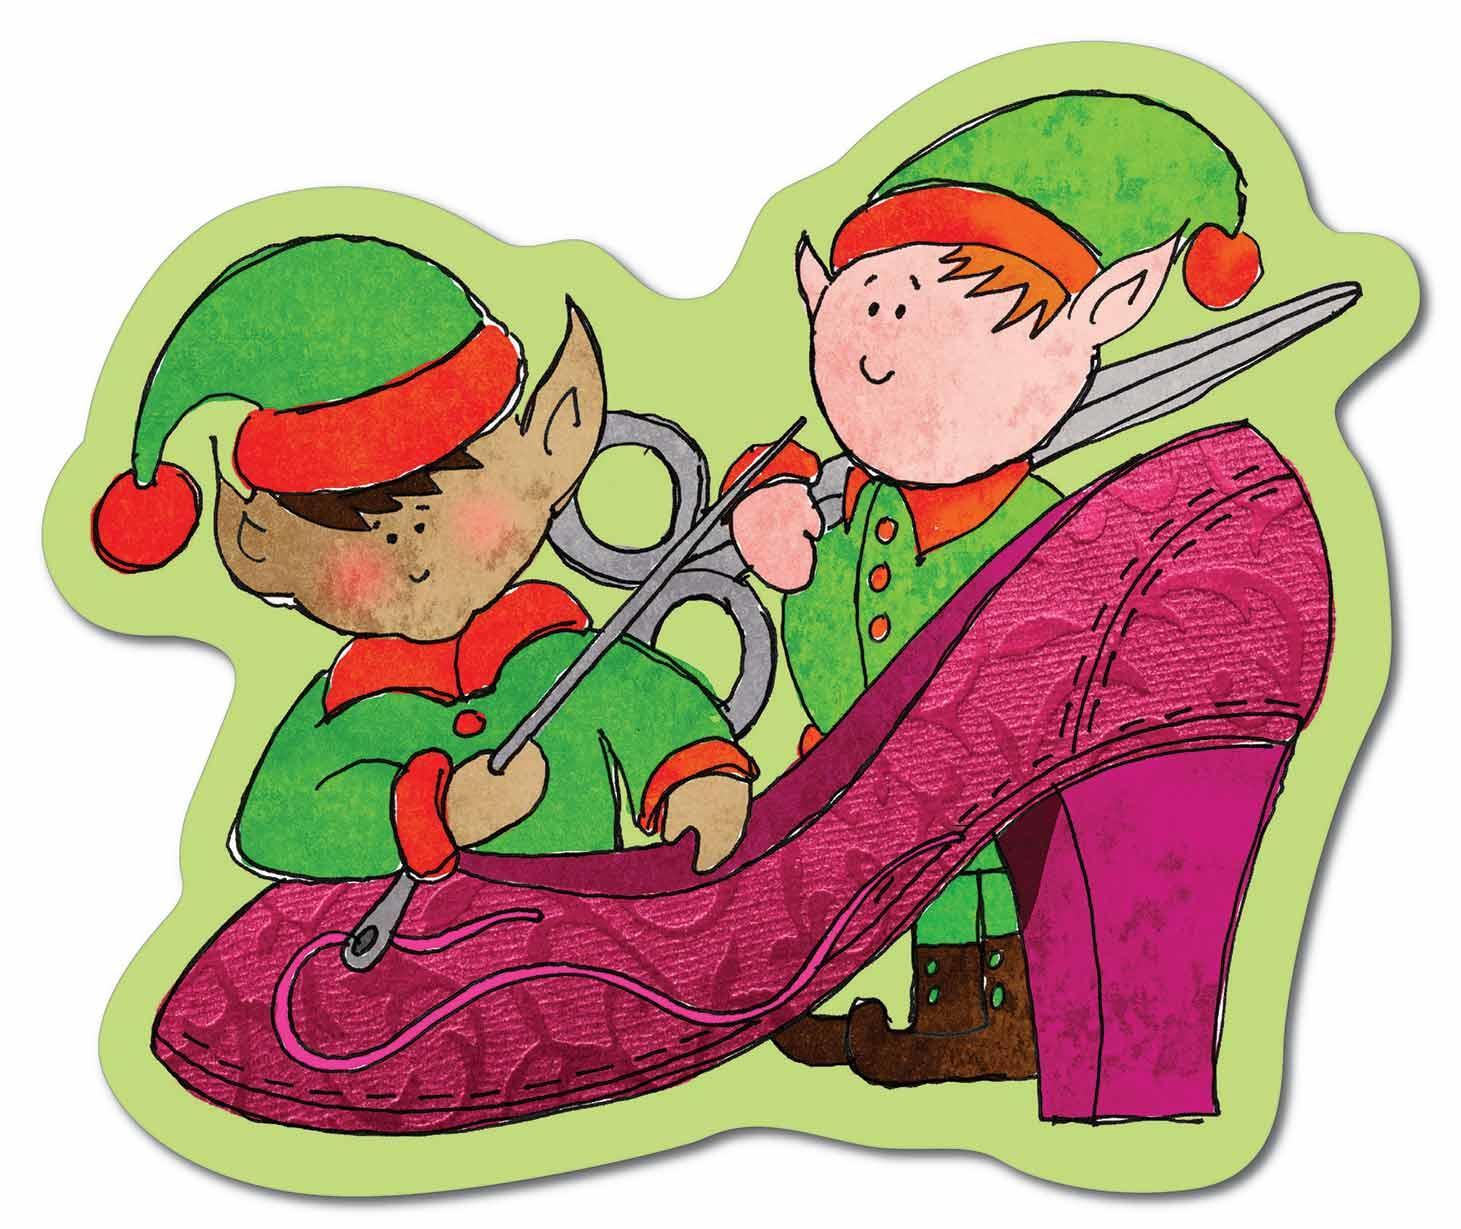 Fairytale Characters - Shoemaker's Elves